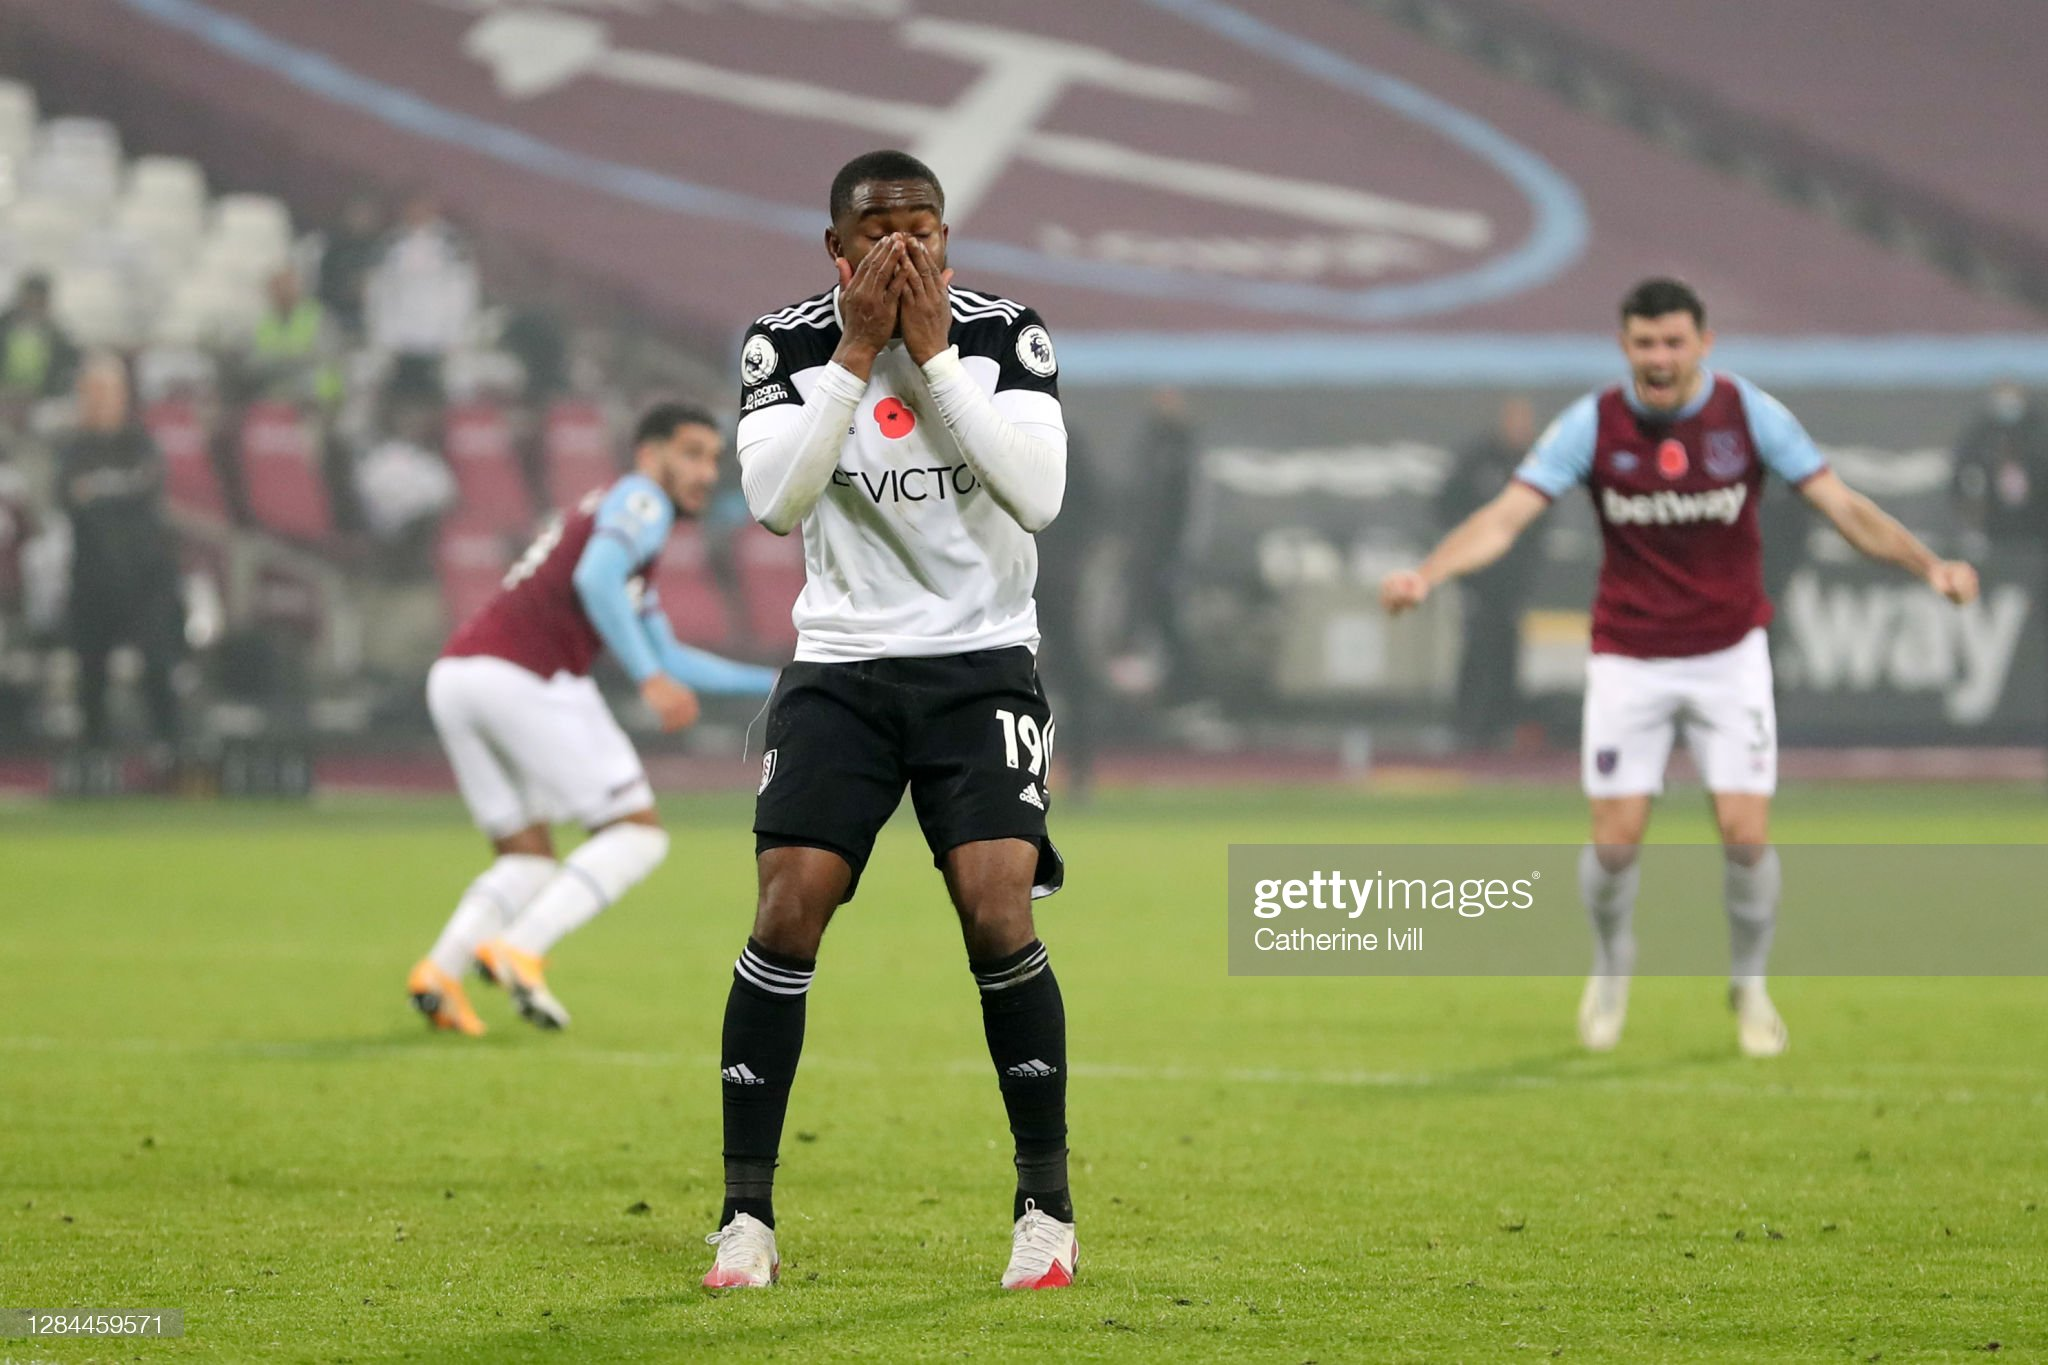 Fulham lose at West Ham after injury-time drama